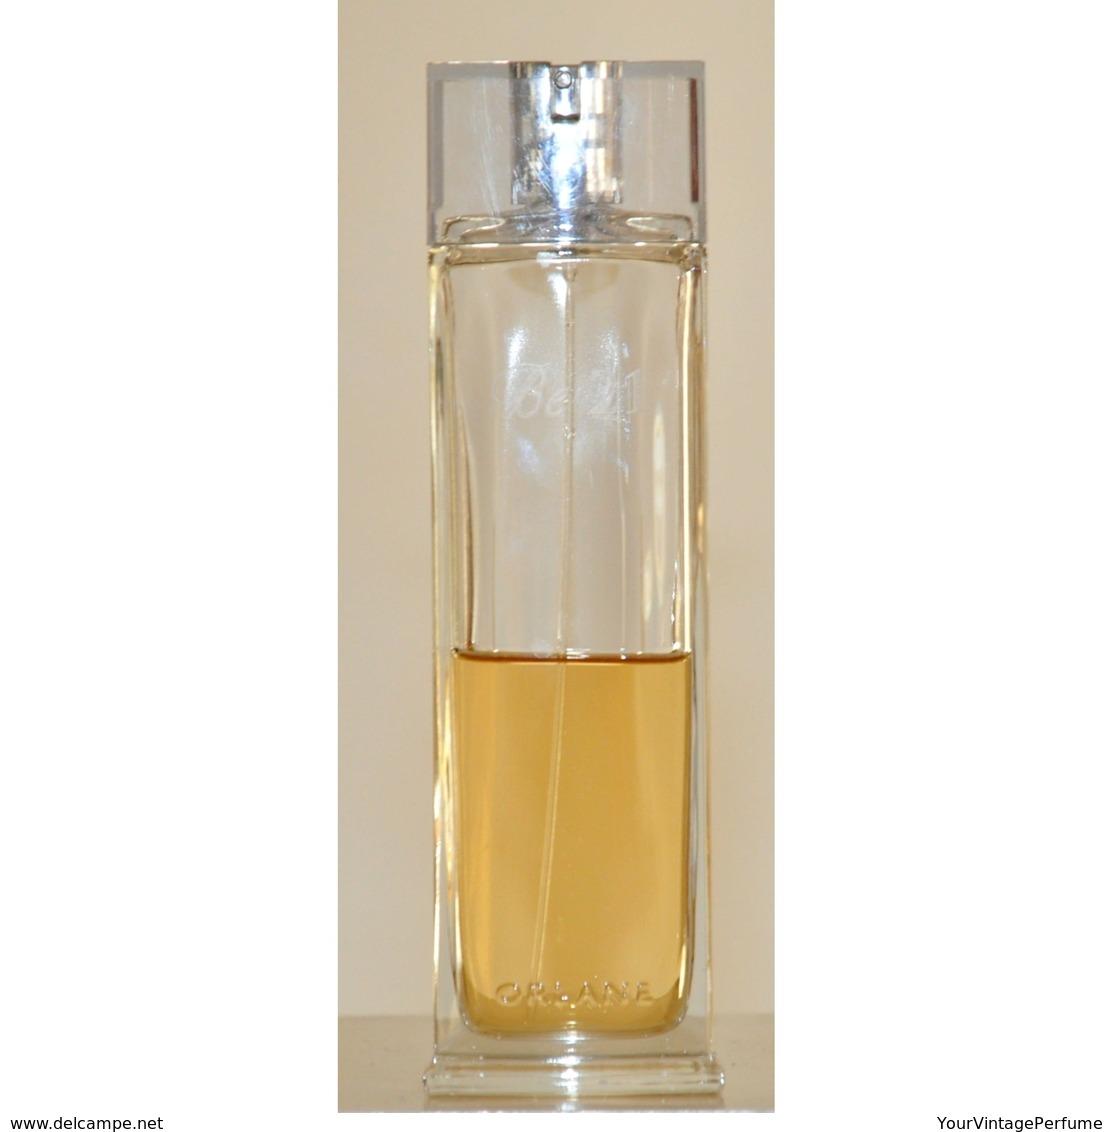 Orlane BE 21 Eau De Parfum Edp 100ML 3.4 Fl. Oz. Spray Perfume Woman Rare Vintage Old 2001 - Fragrances (new And Unused)